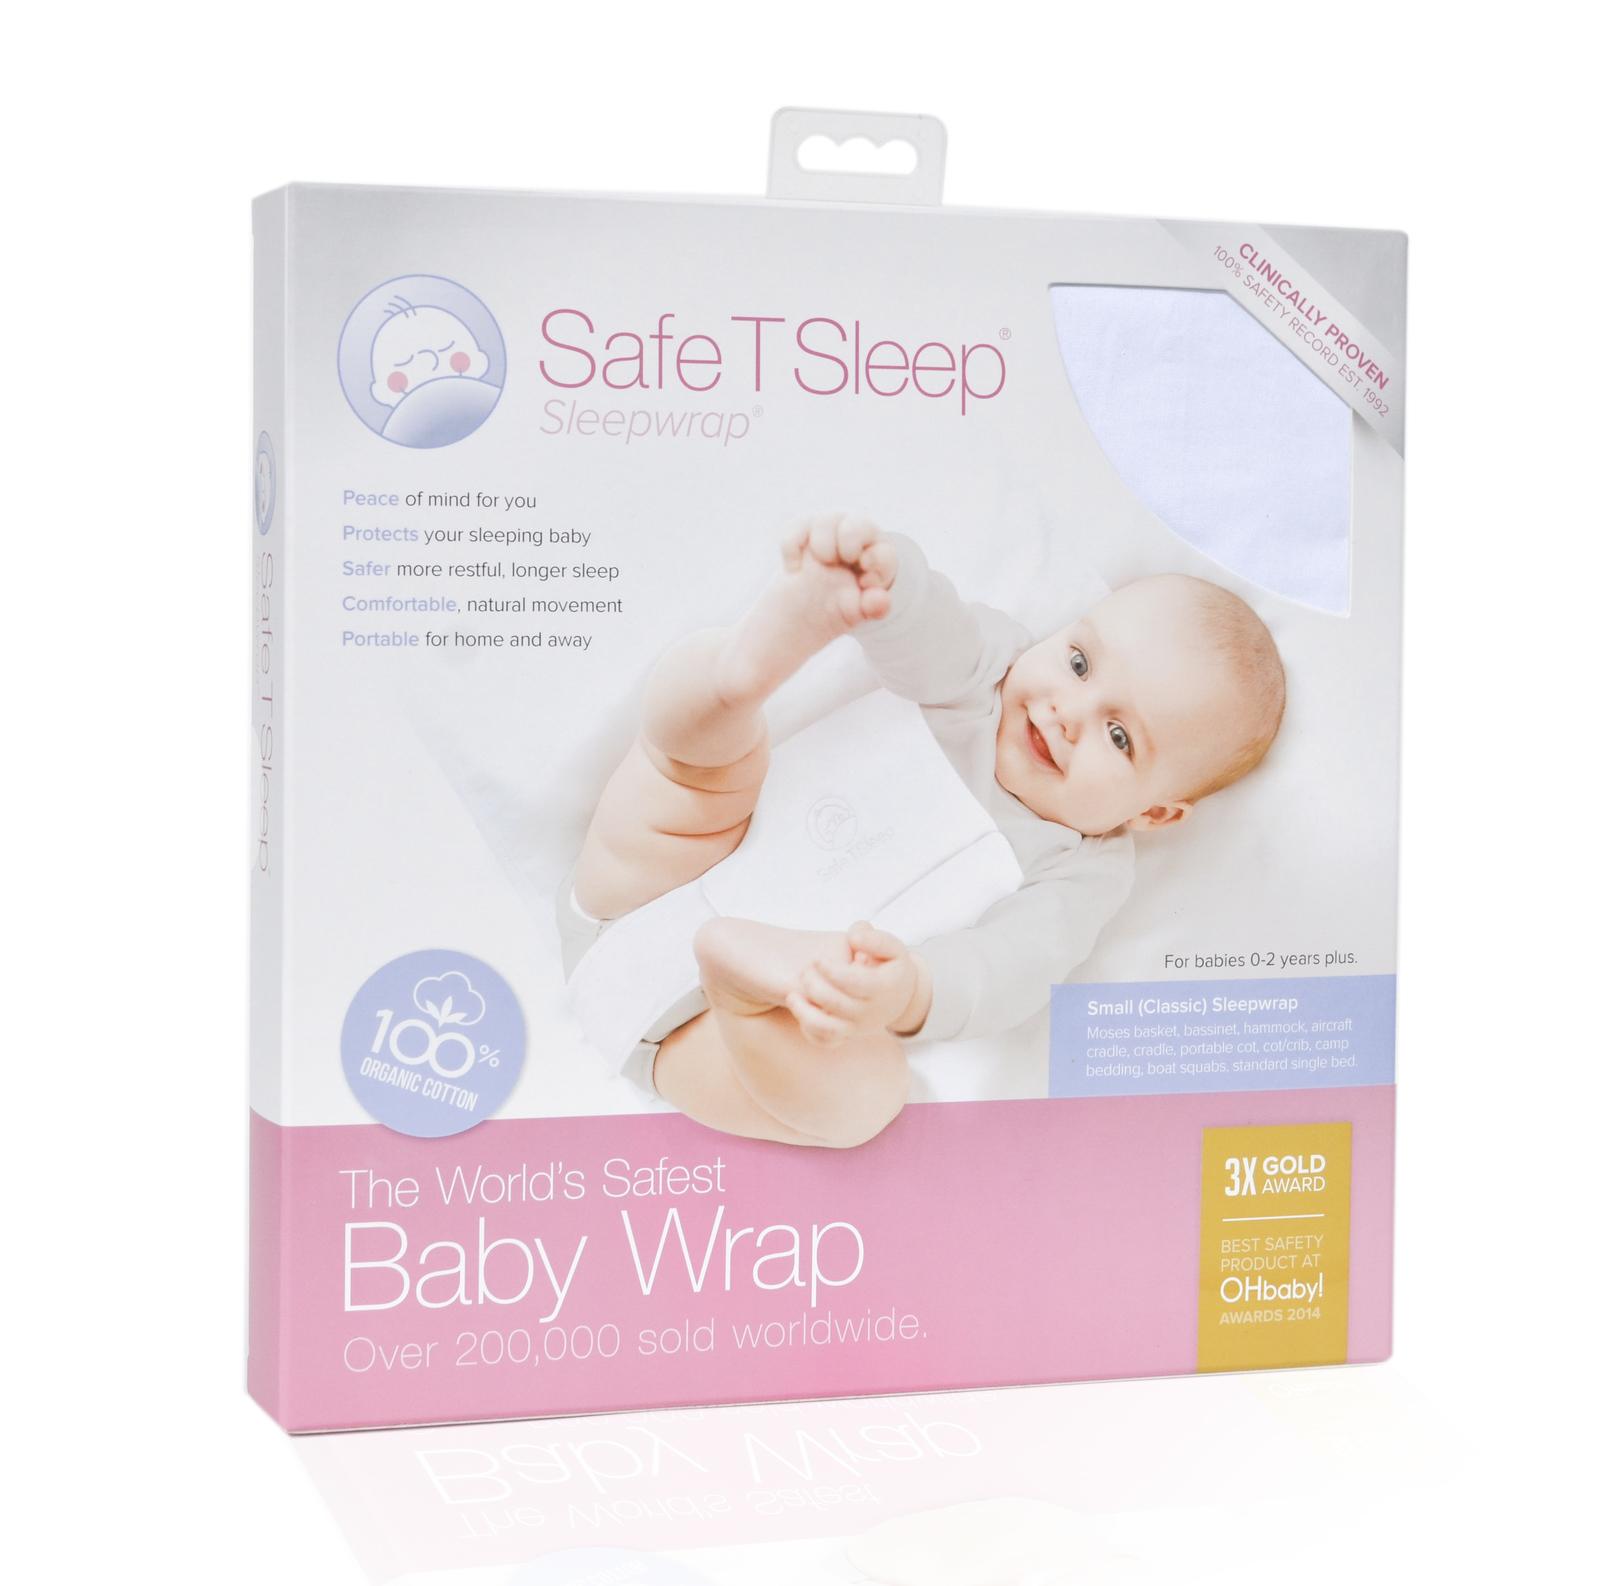 Safe T Sleep Sleepwrap-Small (classic) image